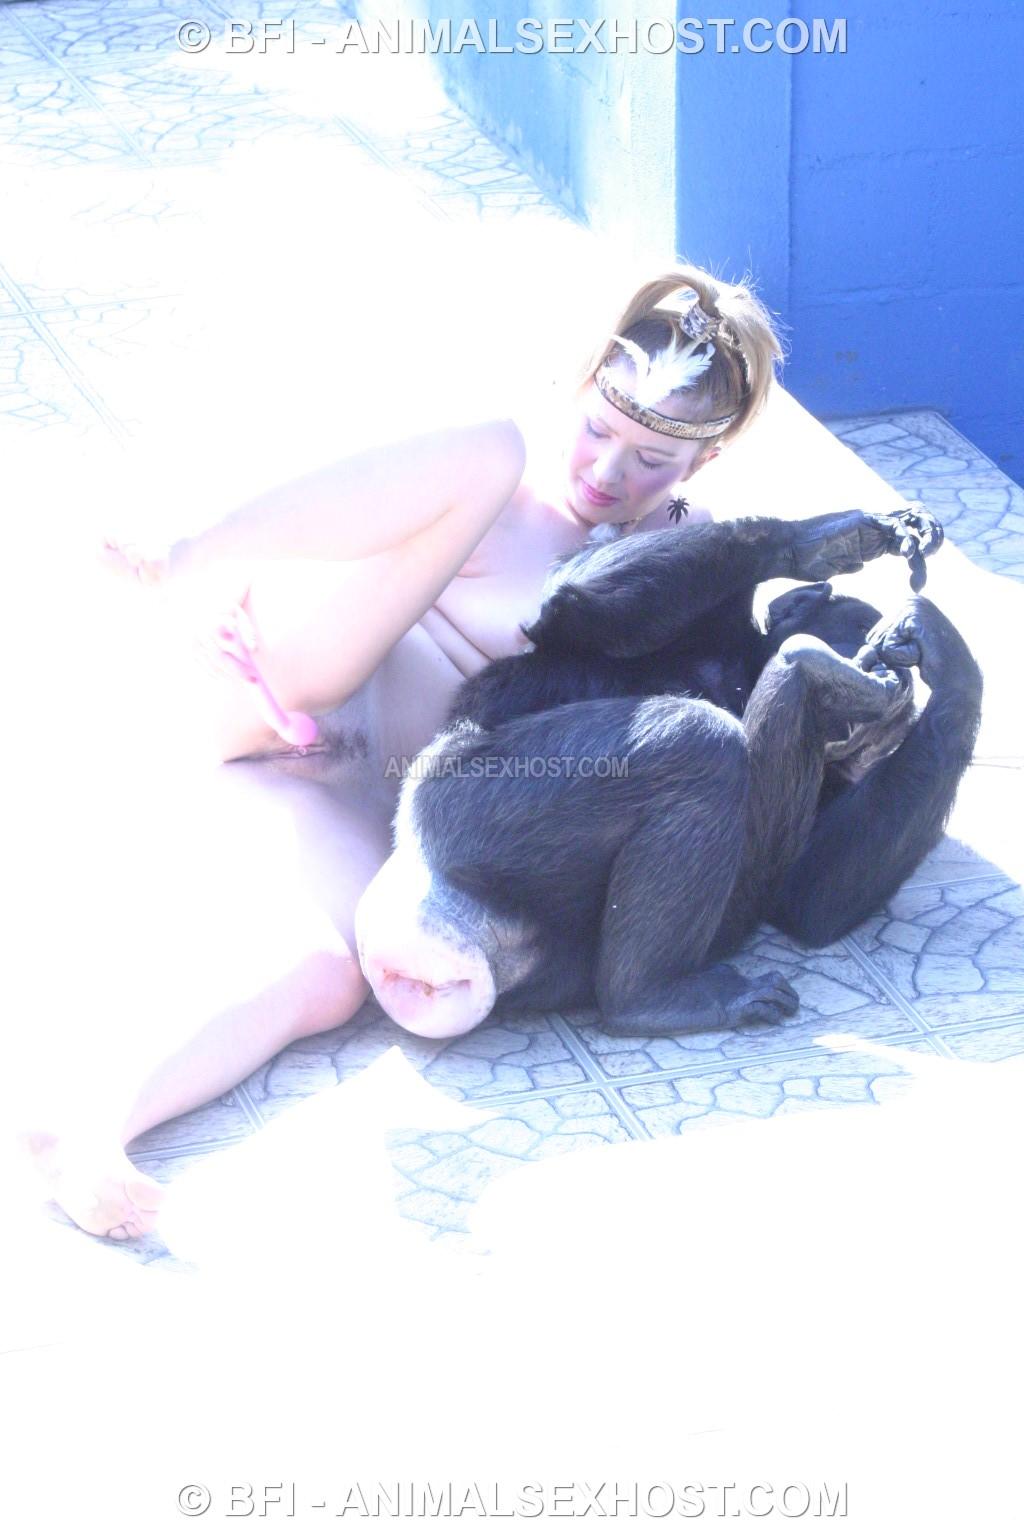 Please Chimpanzee sex videos that would